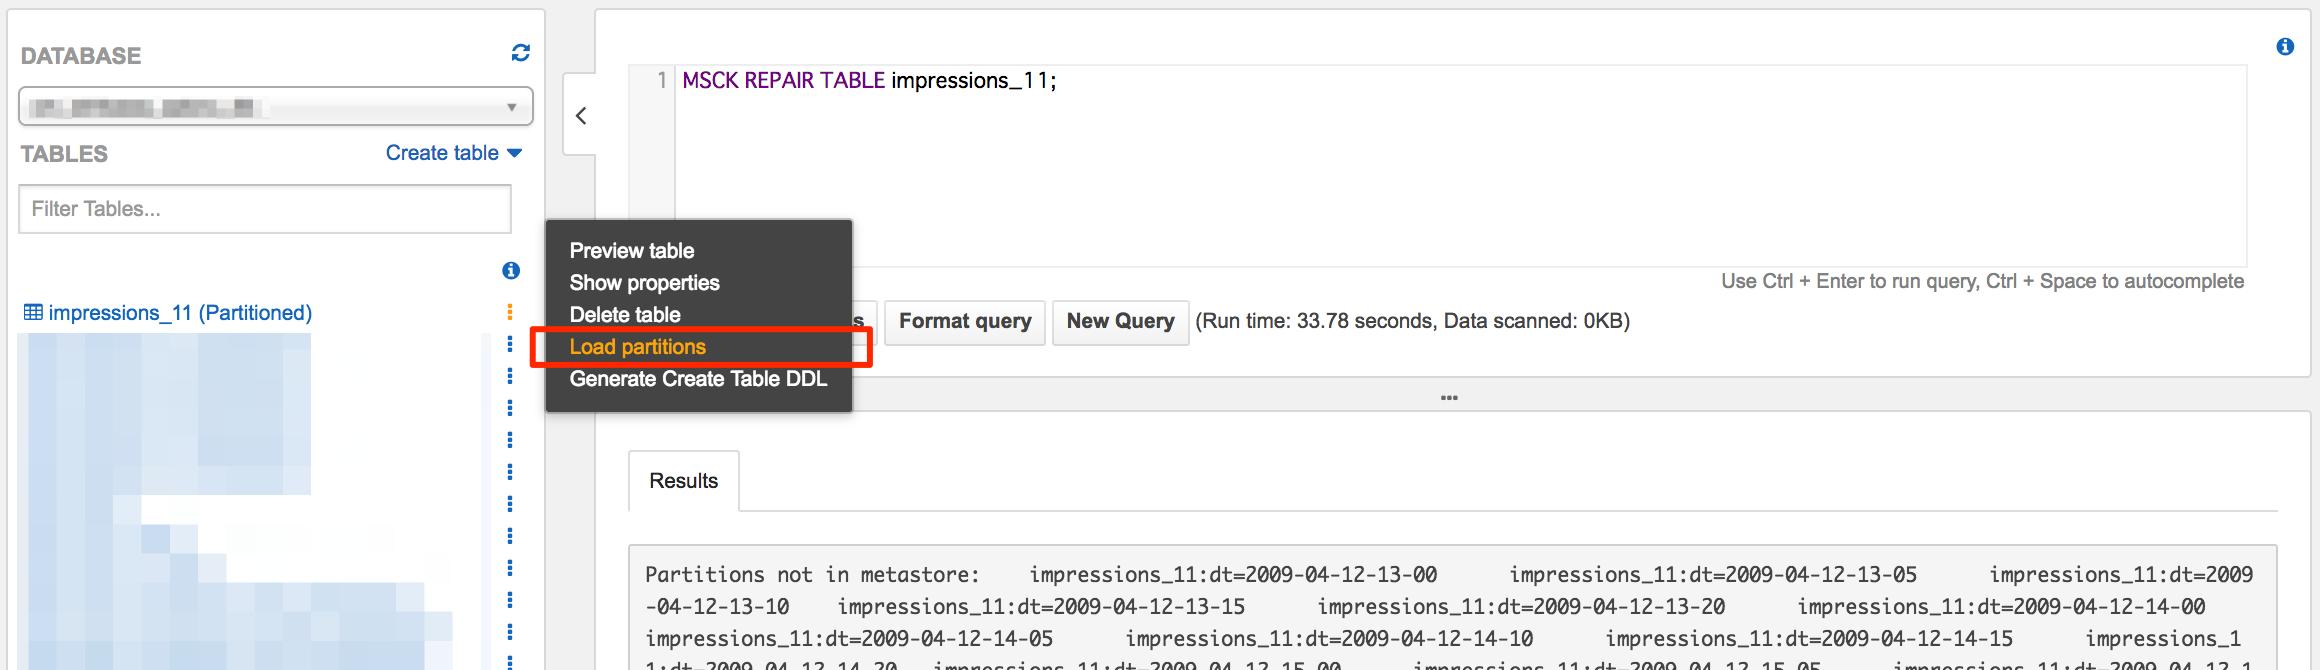 Amazon Redshift Spectrum がスカラーJSONおよびIonデータ型をサポート